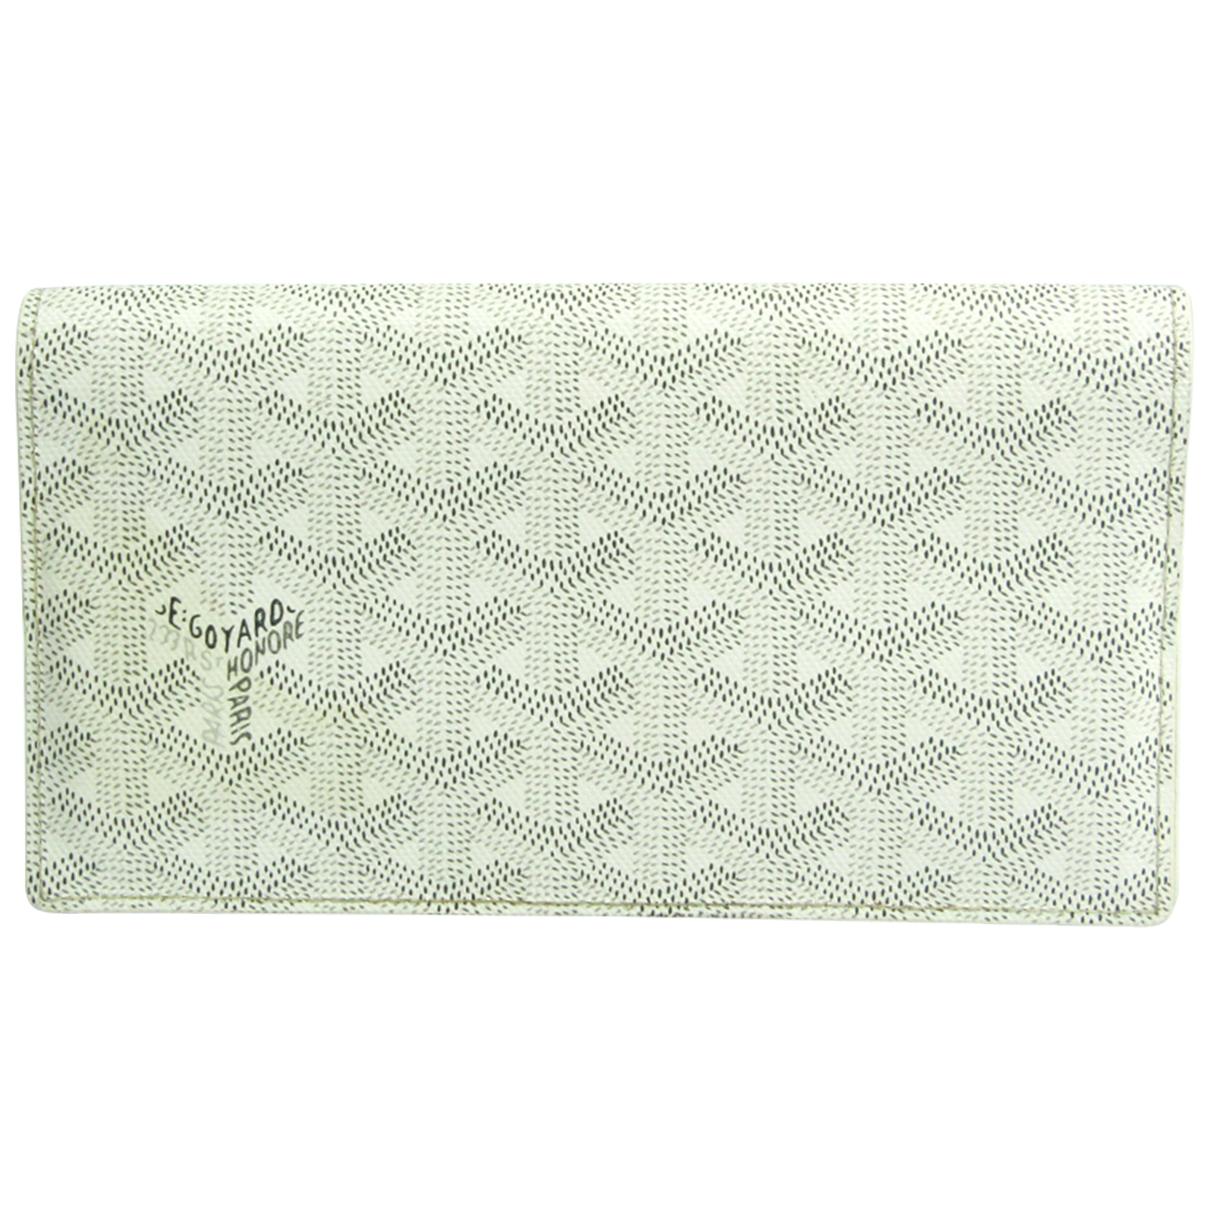 Goyard Richelieu White Cloth wallet for Women N